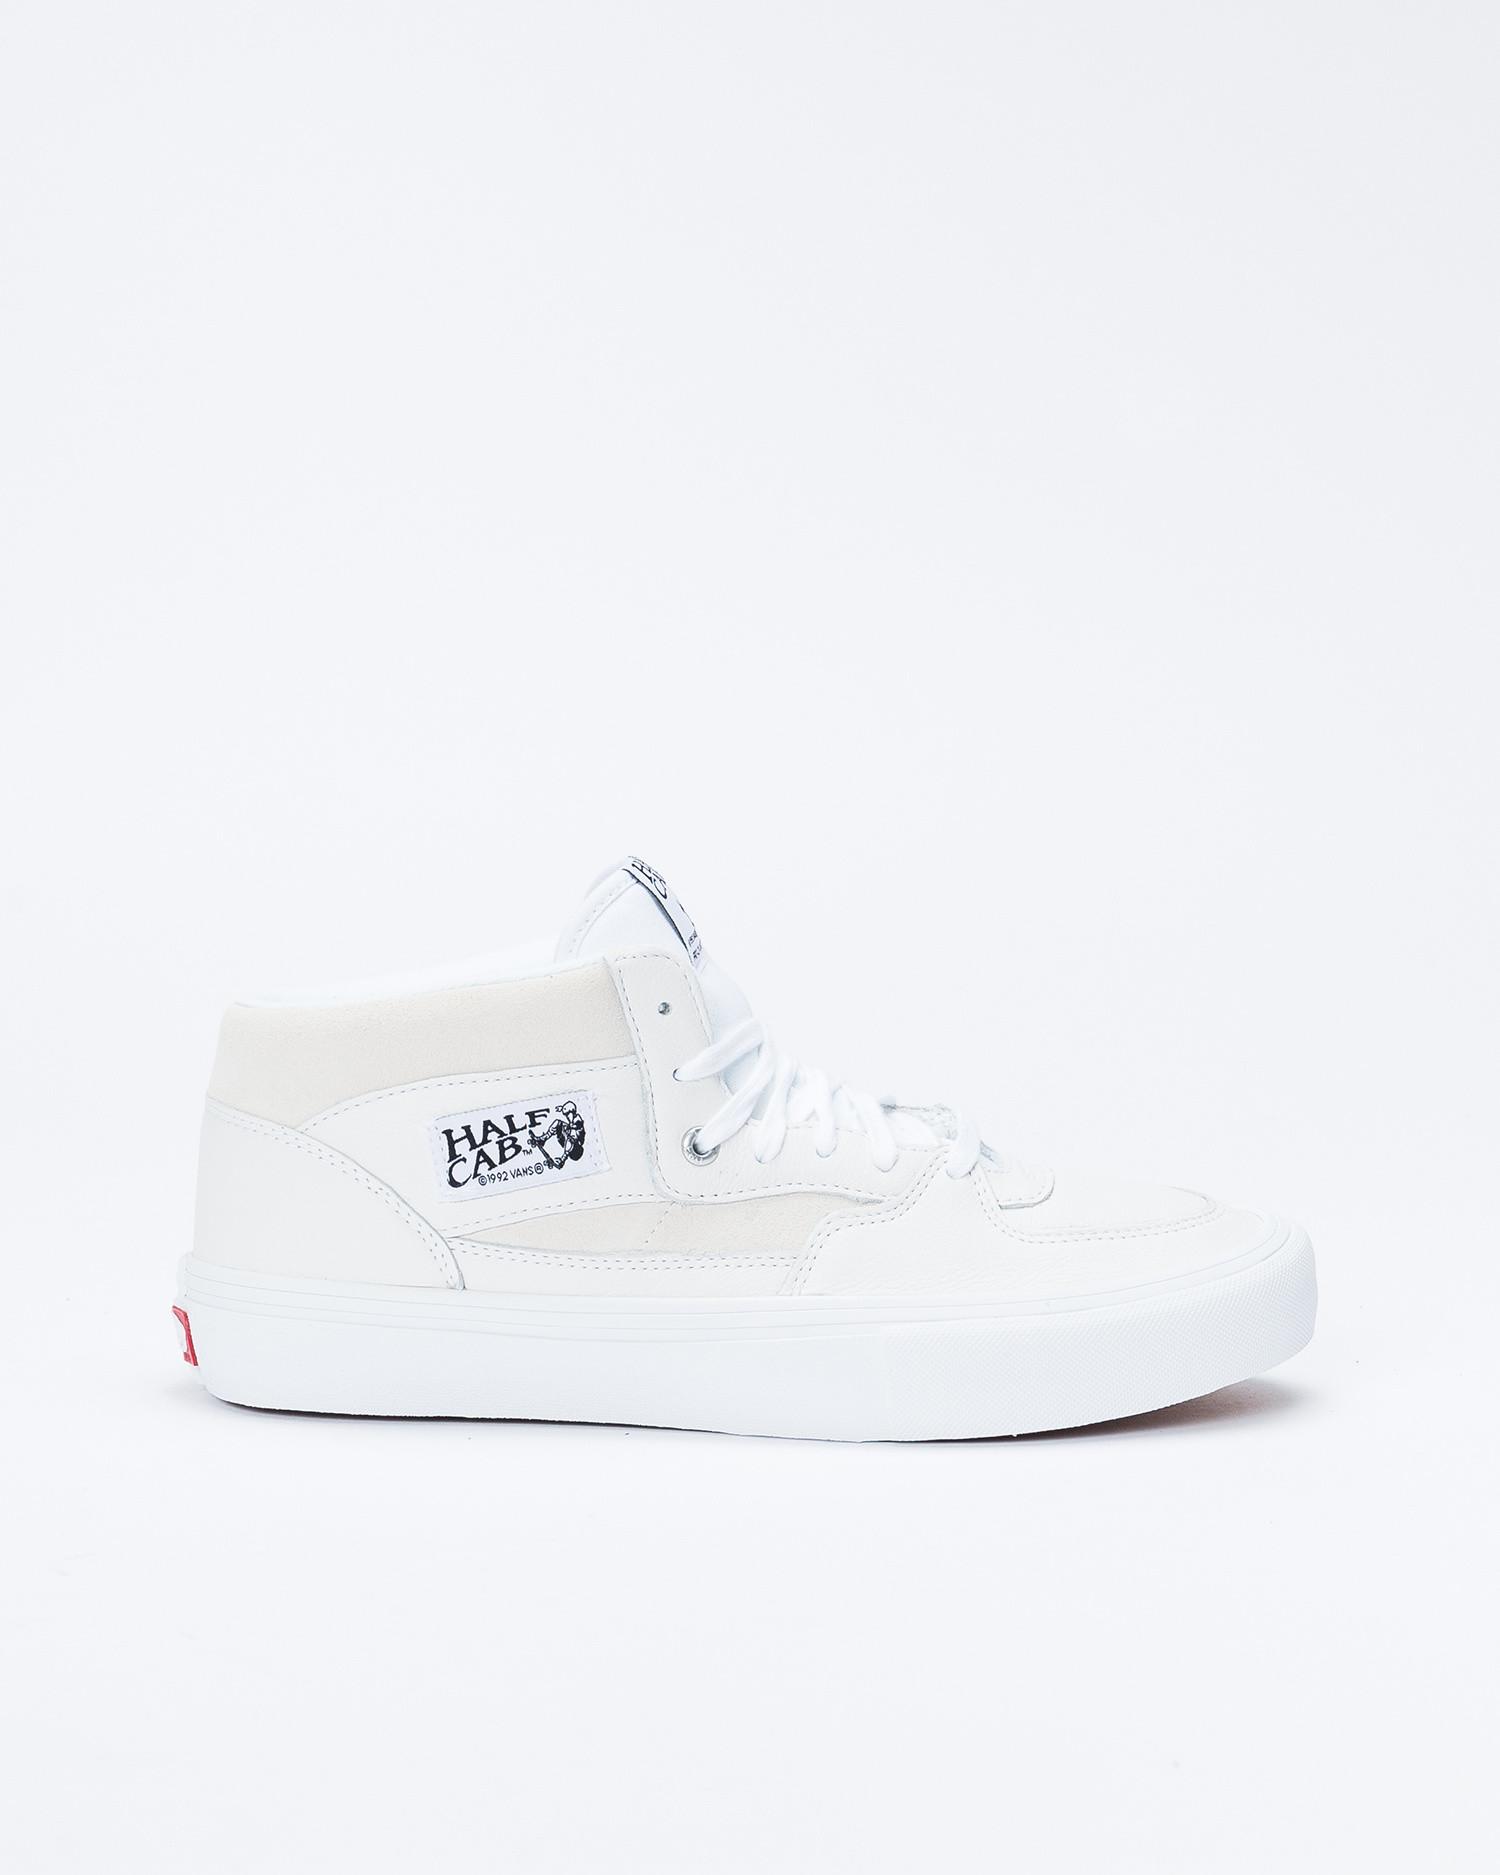 Vans Half Cab Pro (Leather) White